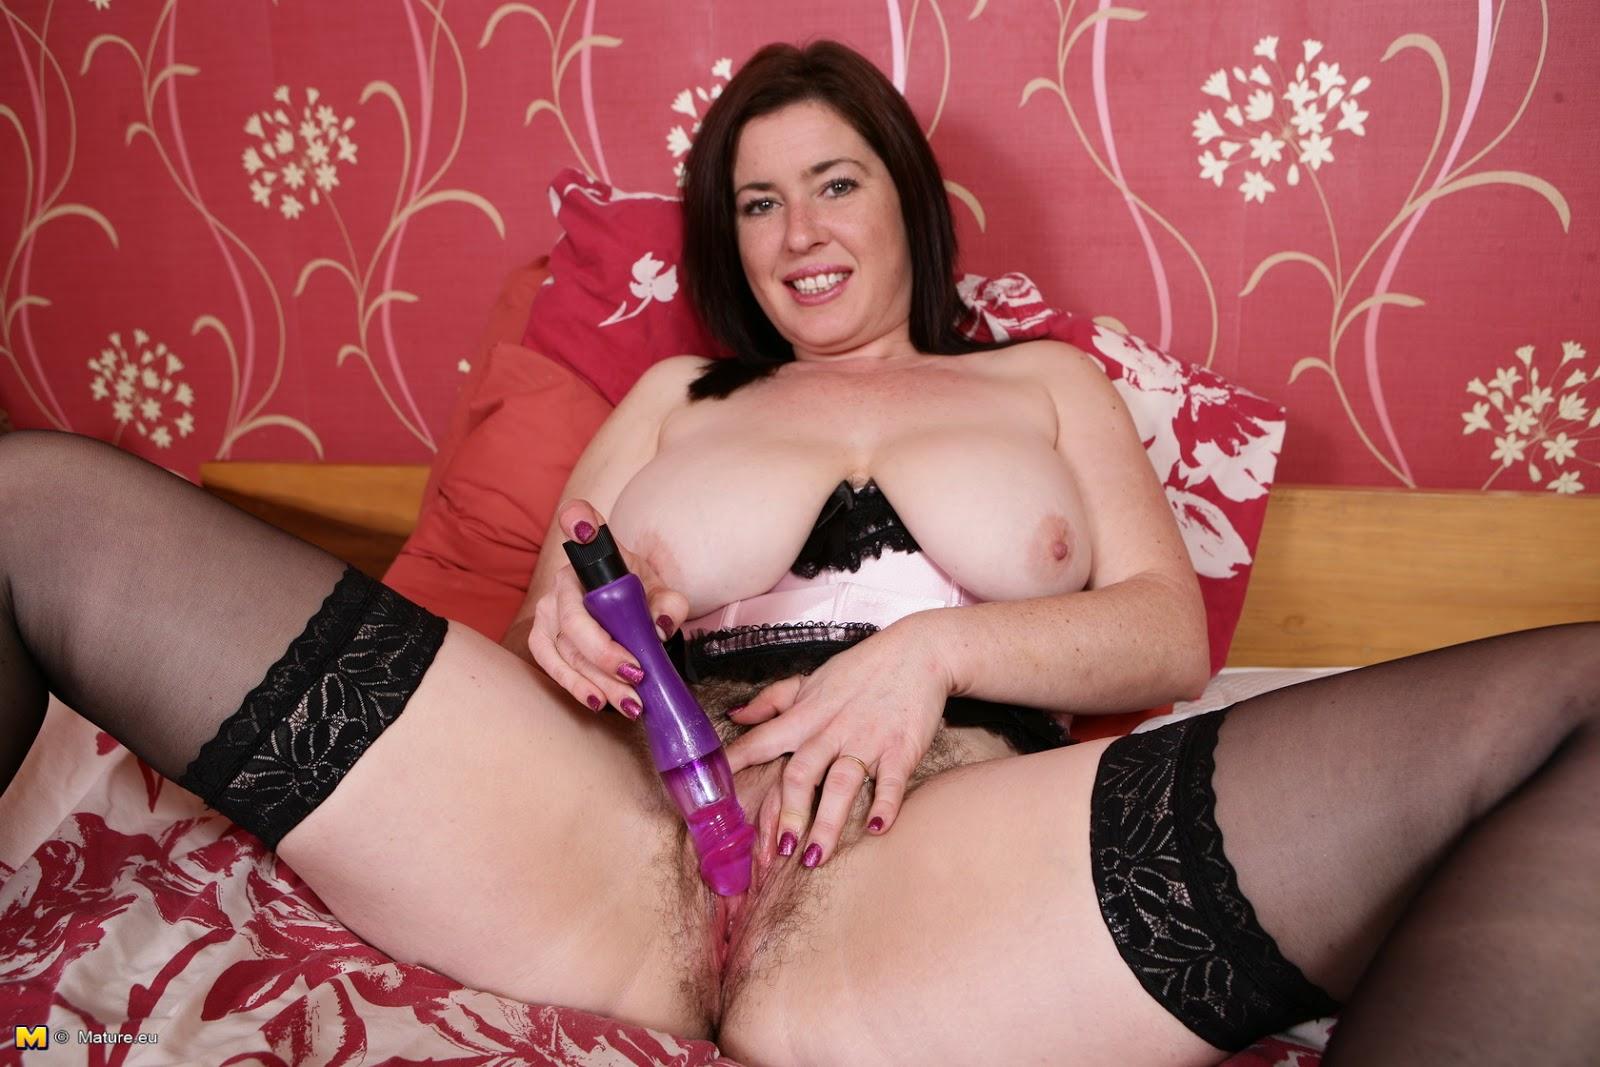 meagan good tits ass